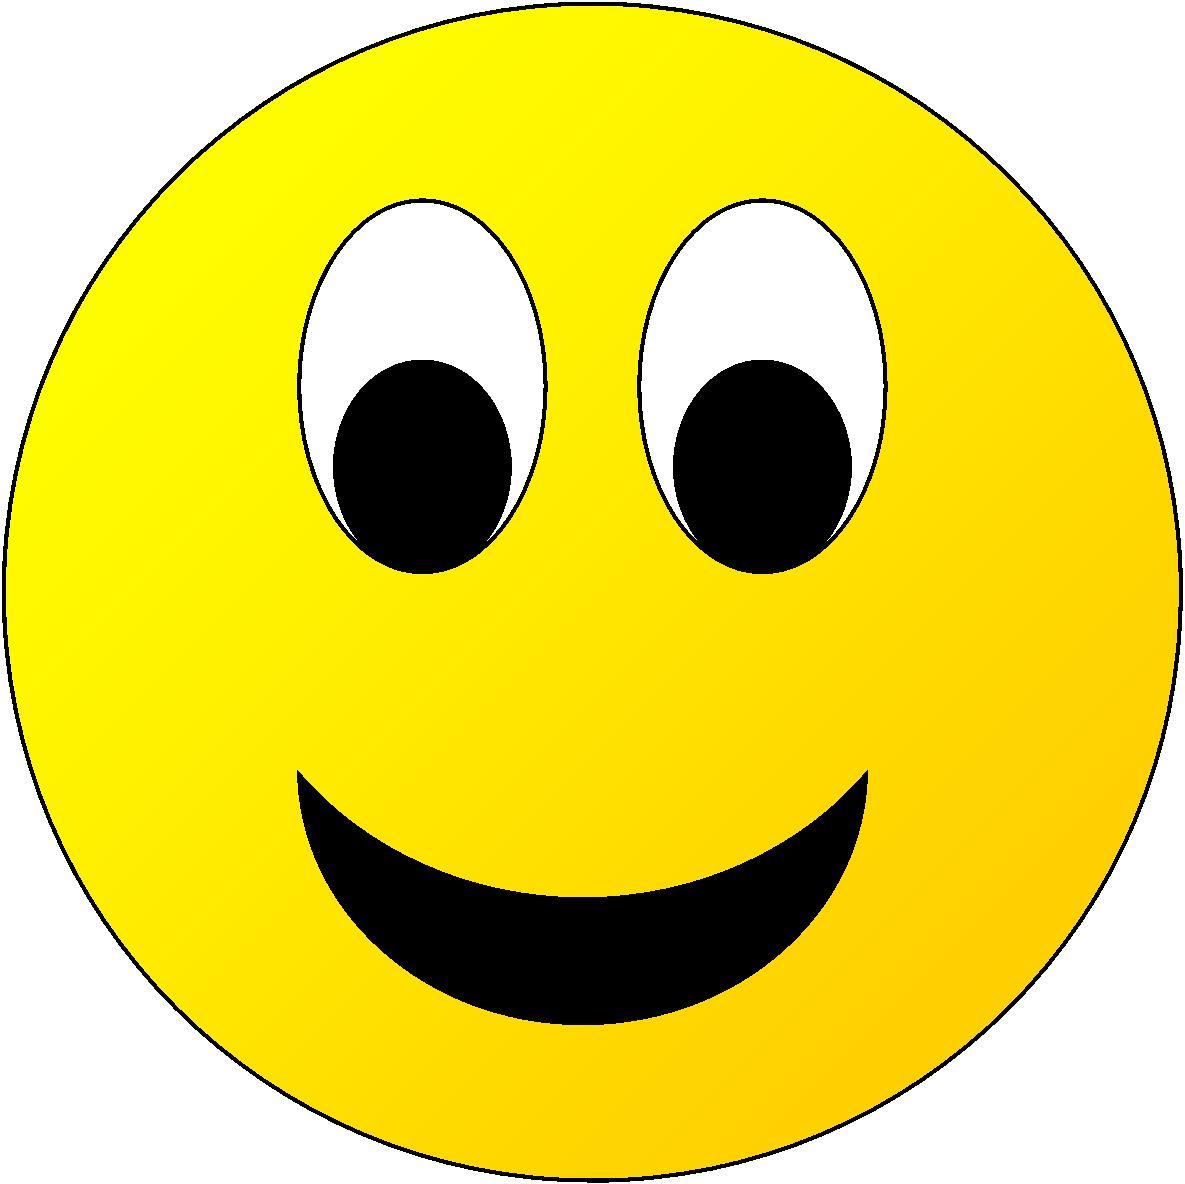 Animated laughing smileys - photo#13